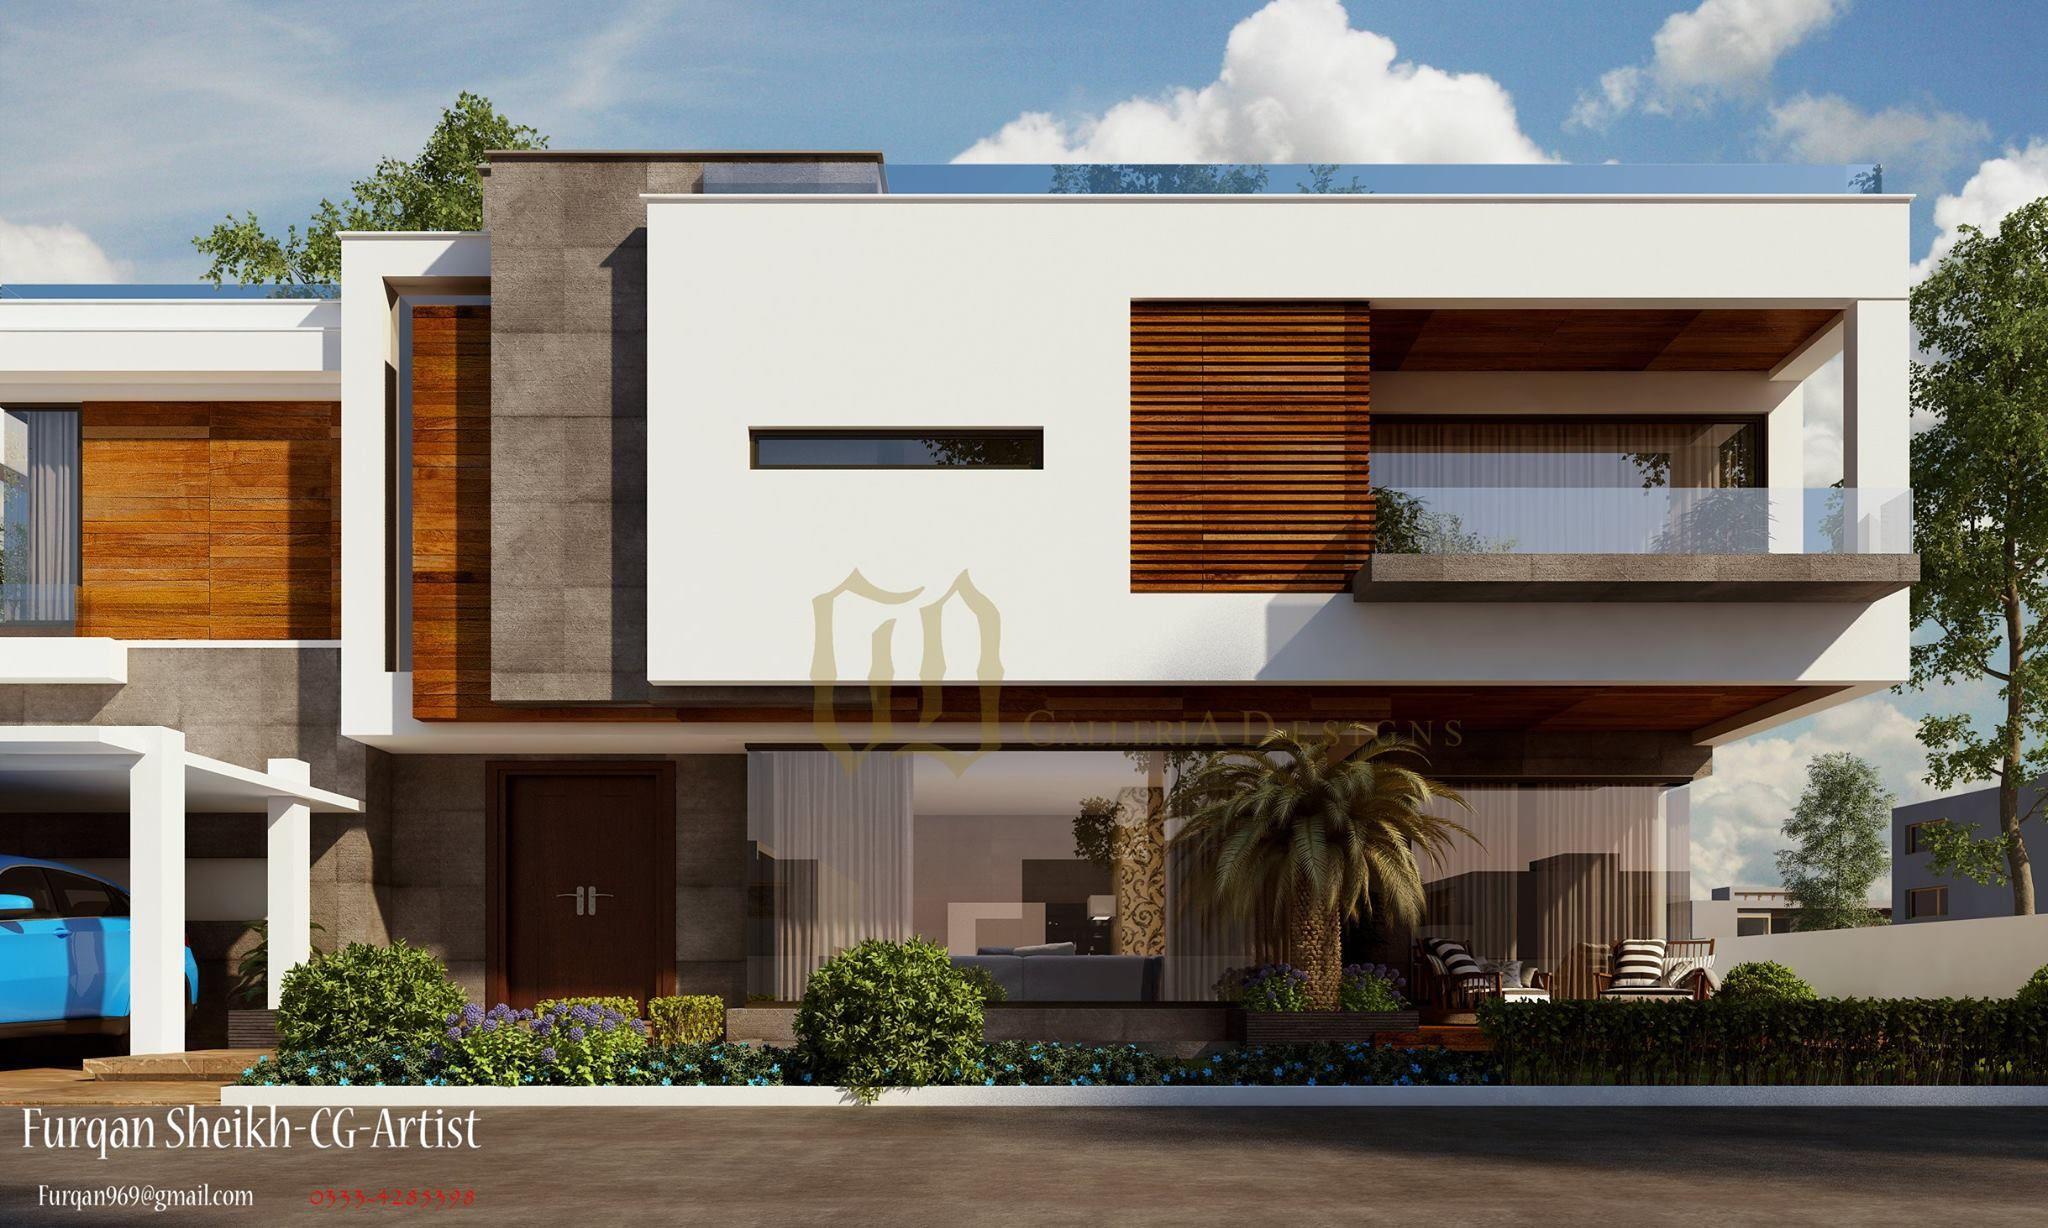 Conemporary residence architecture home designs pakistan galleria also rh pinterest